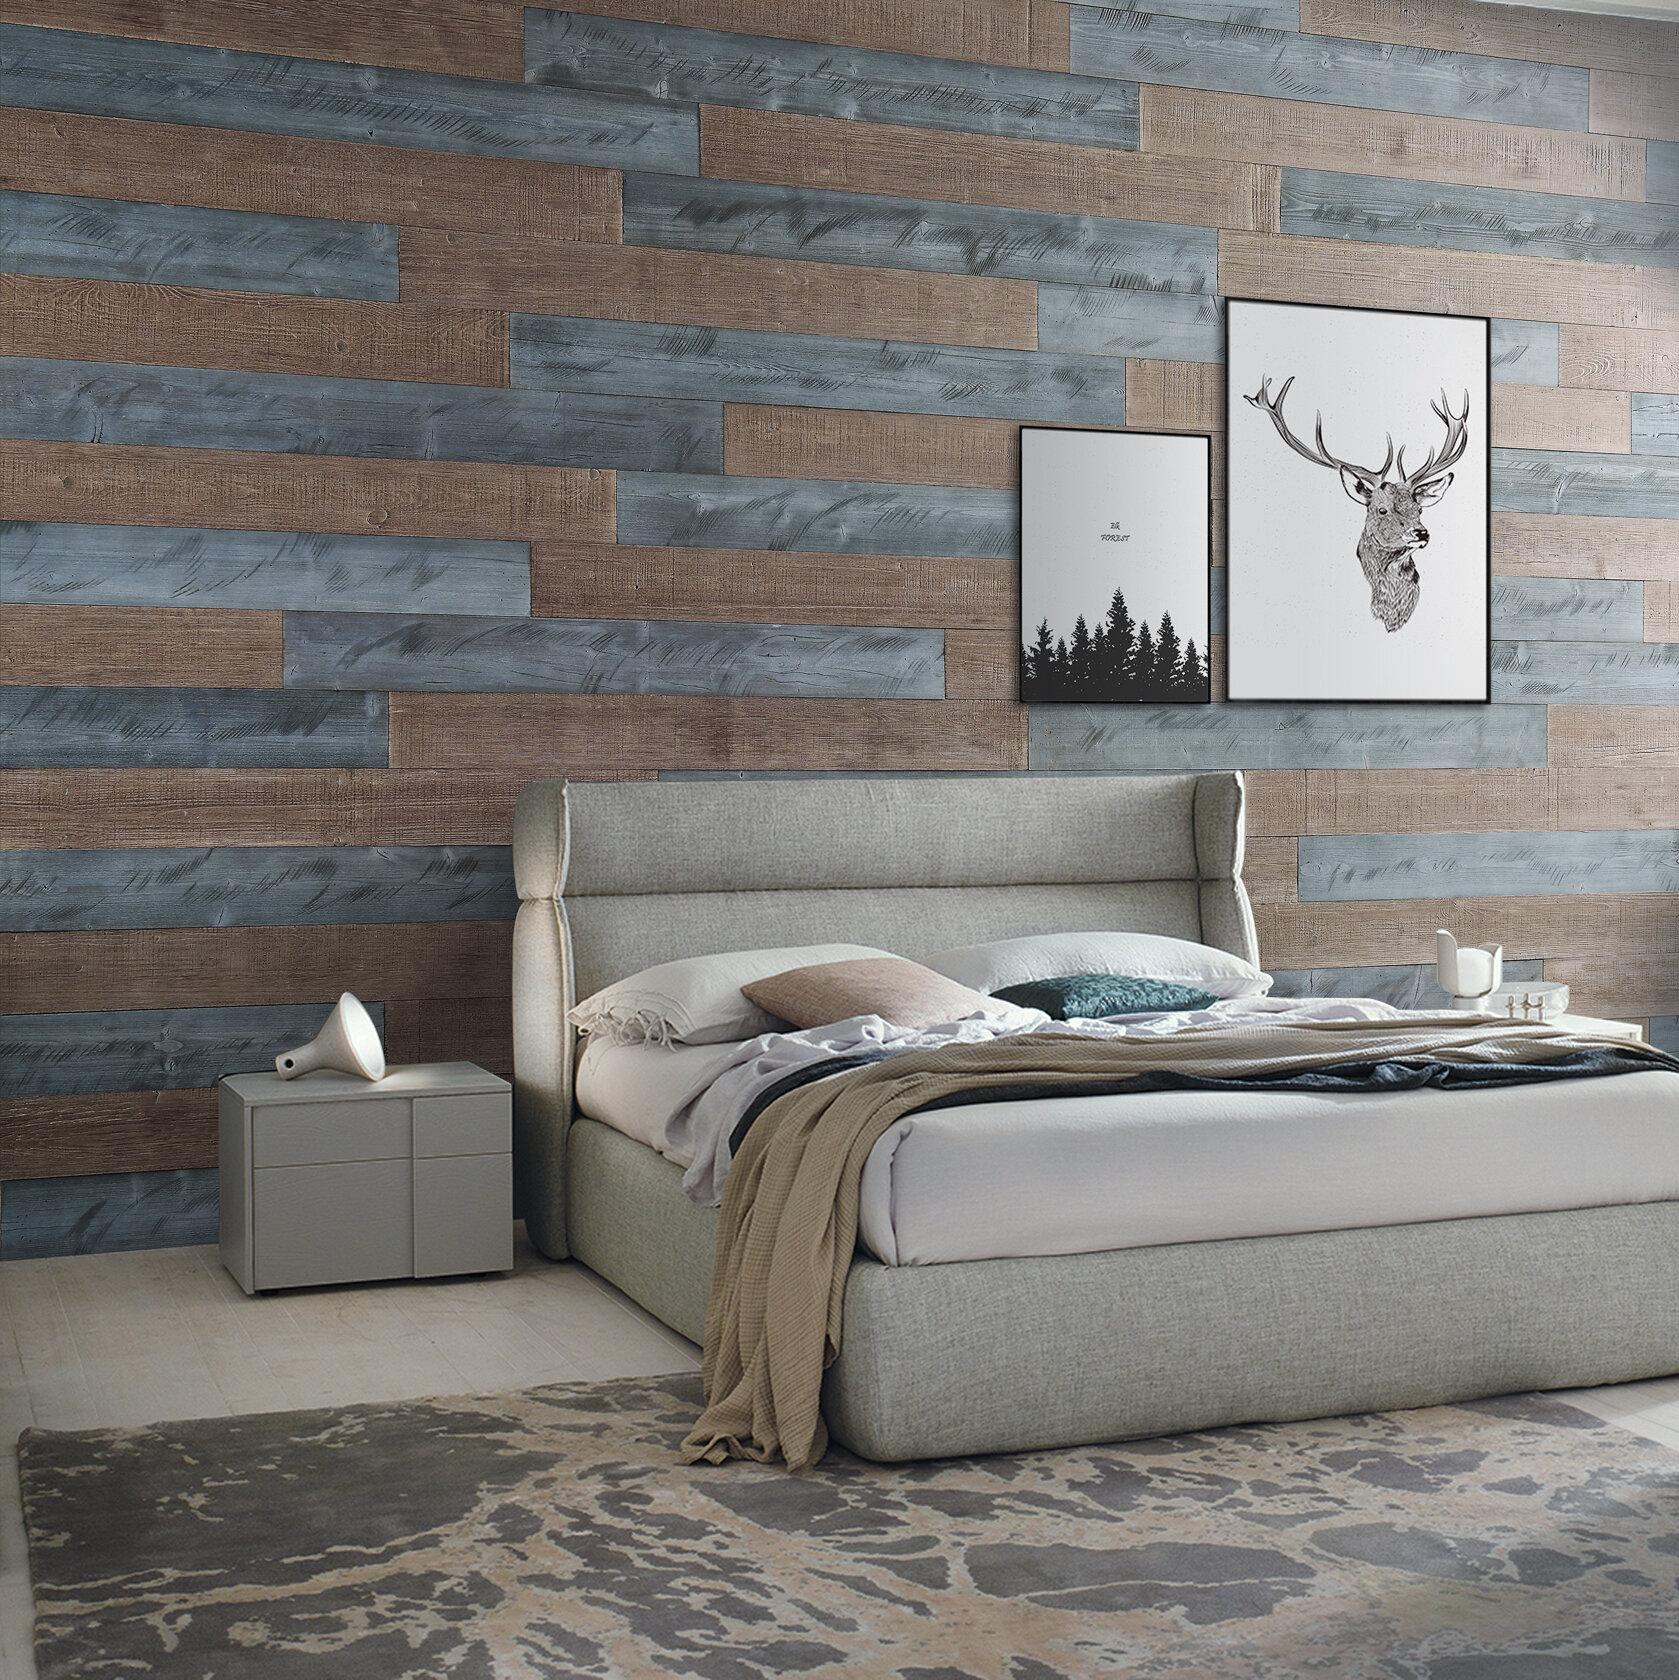 Woodywalls 5 Solid Wood Wall Paneling In Natural Gray Warm Sand Wayfair